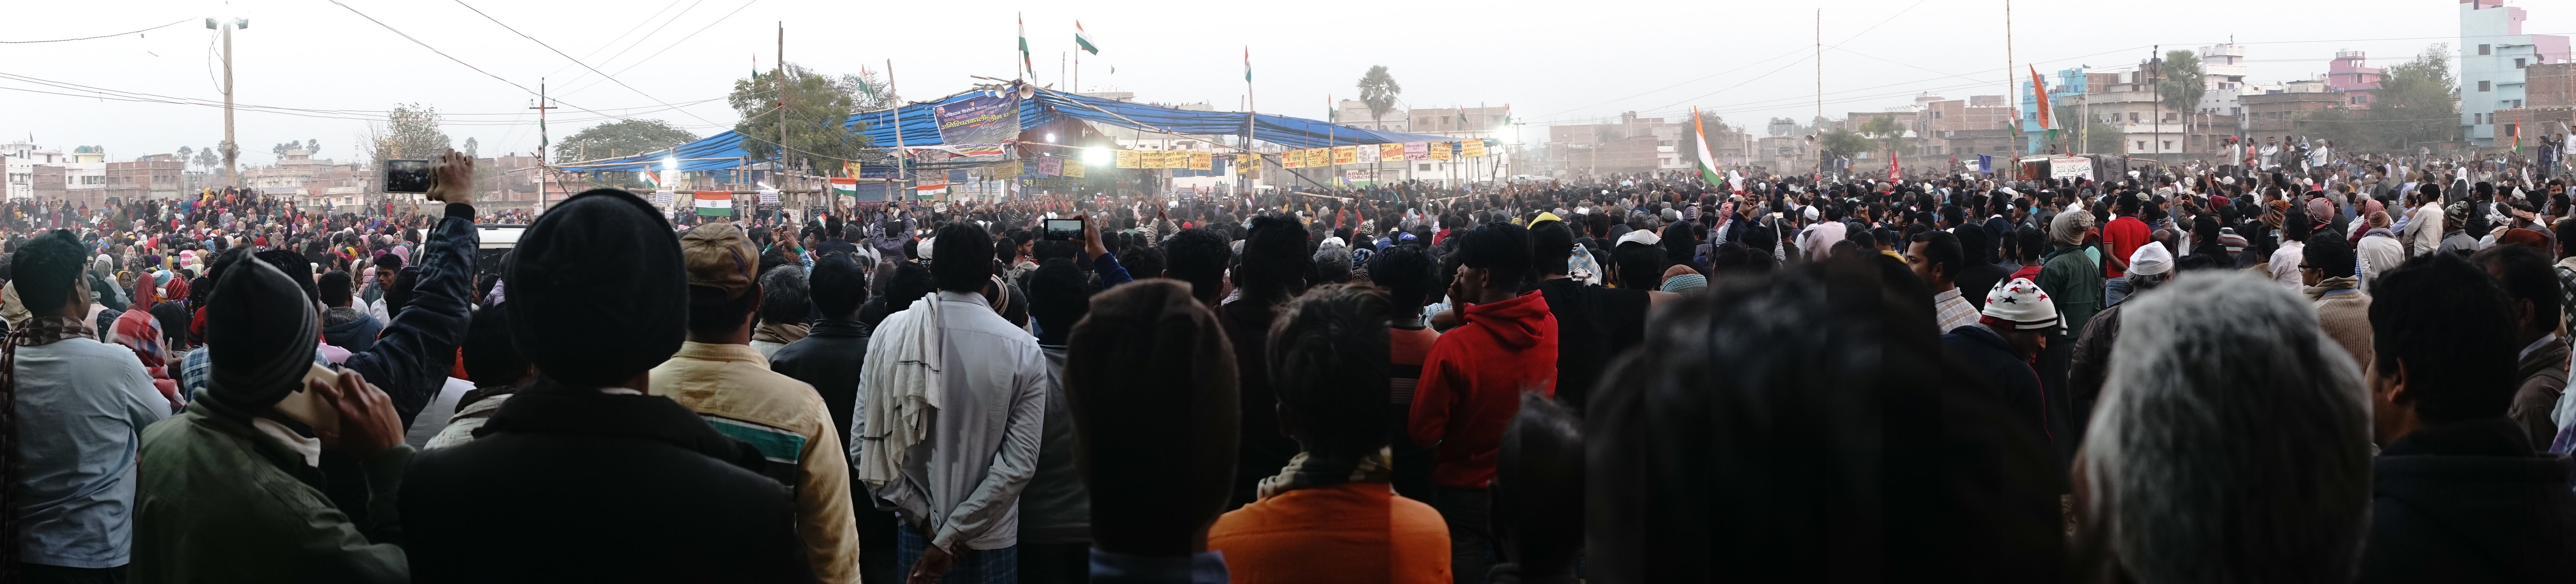 Rally ground, anti-CAA yatra in Jamui, India, 2020 | J-T.M.